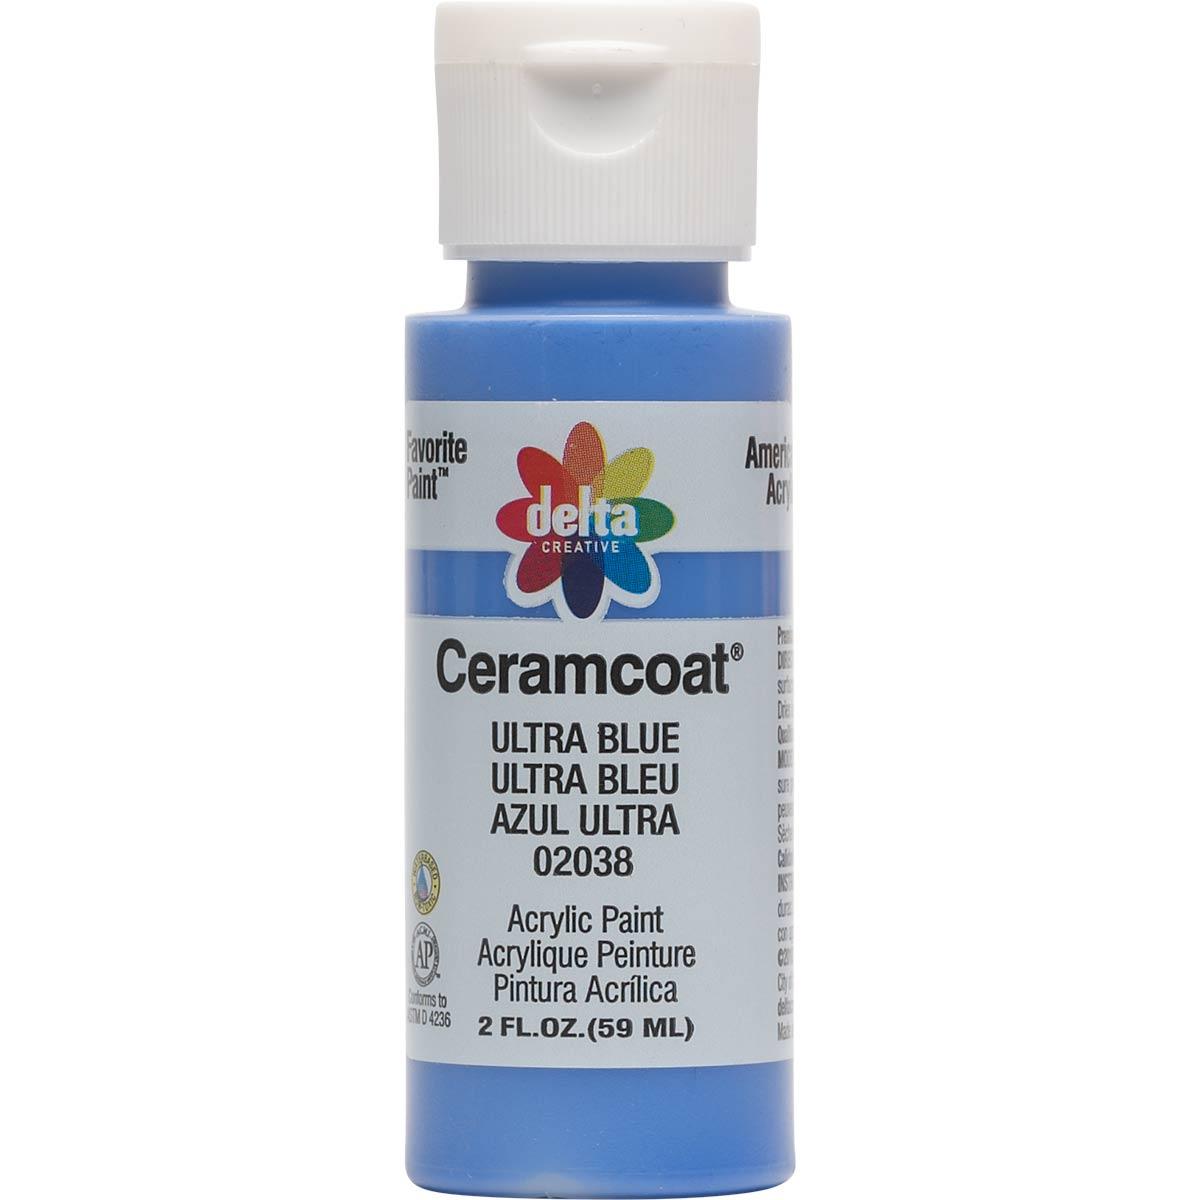 Delta Ceramcoat ® Acrylic Paint - Ultra Blue, 2 oz.